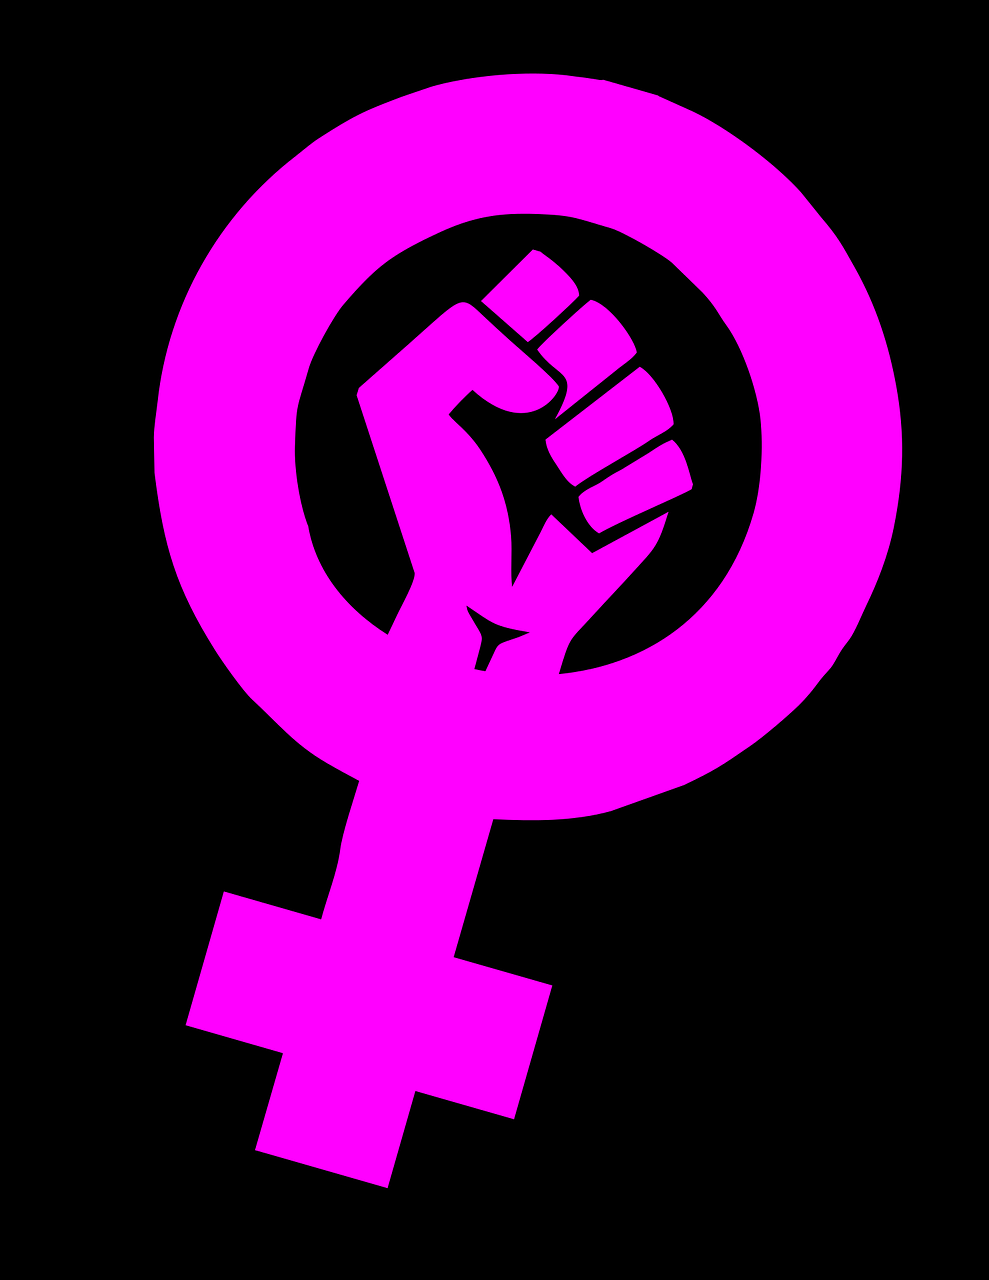 A feminist logo